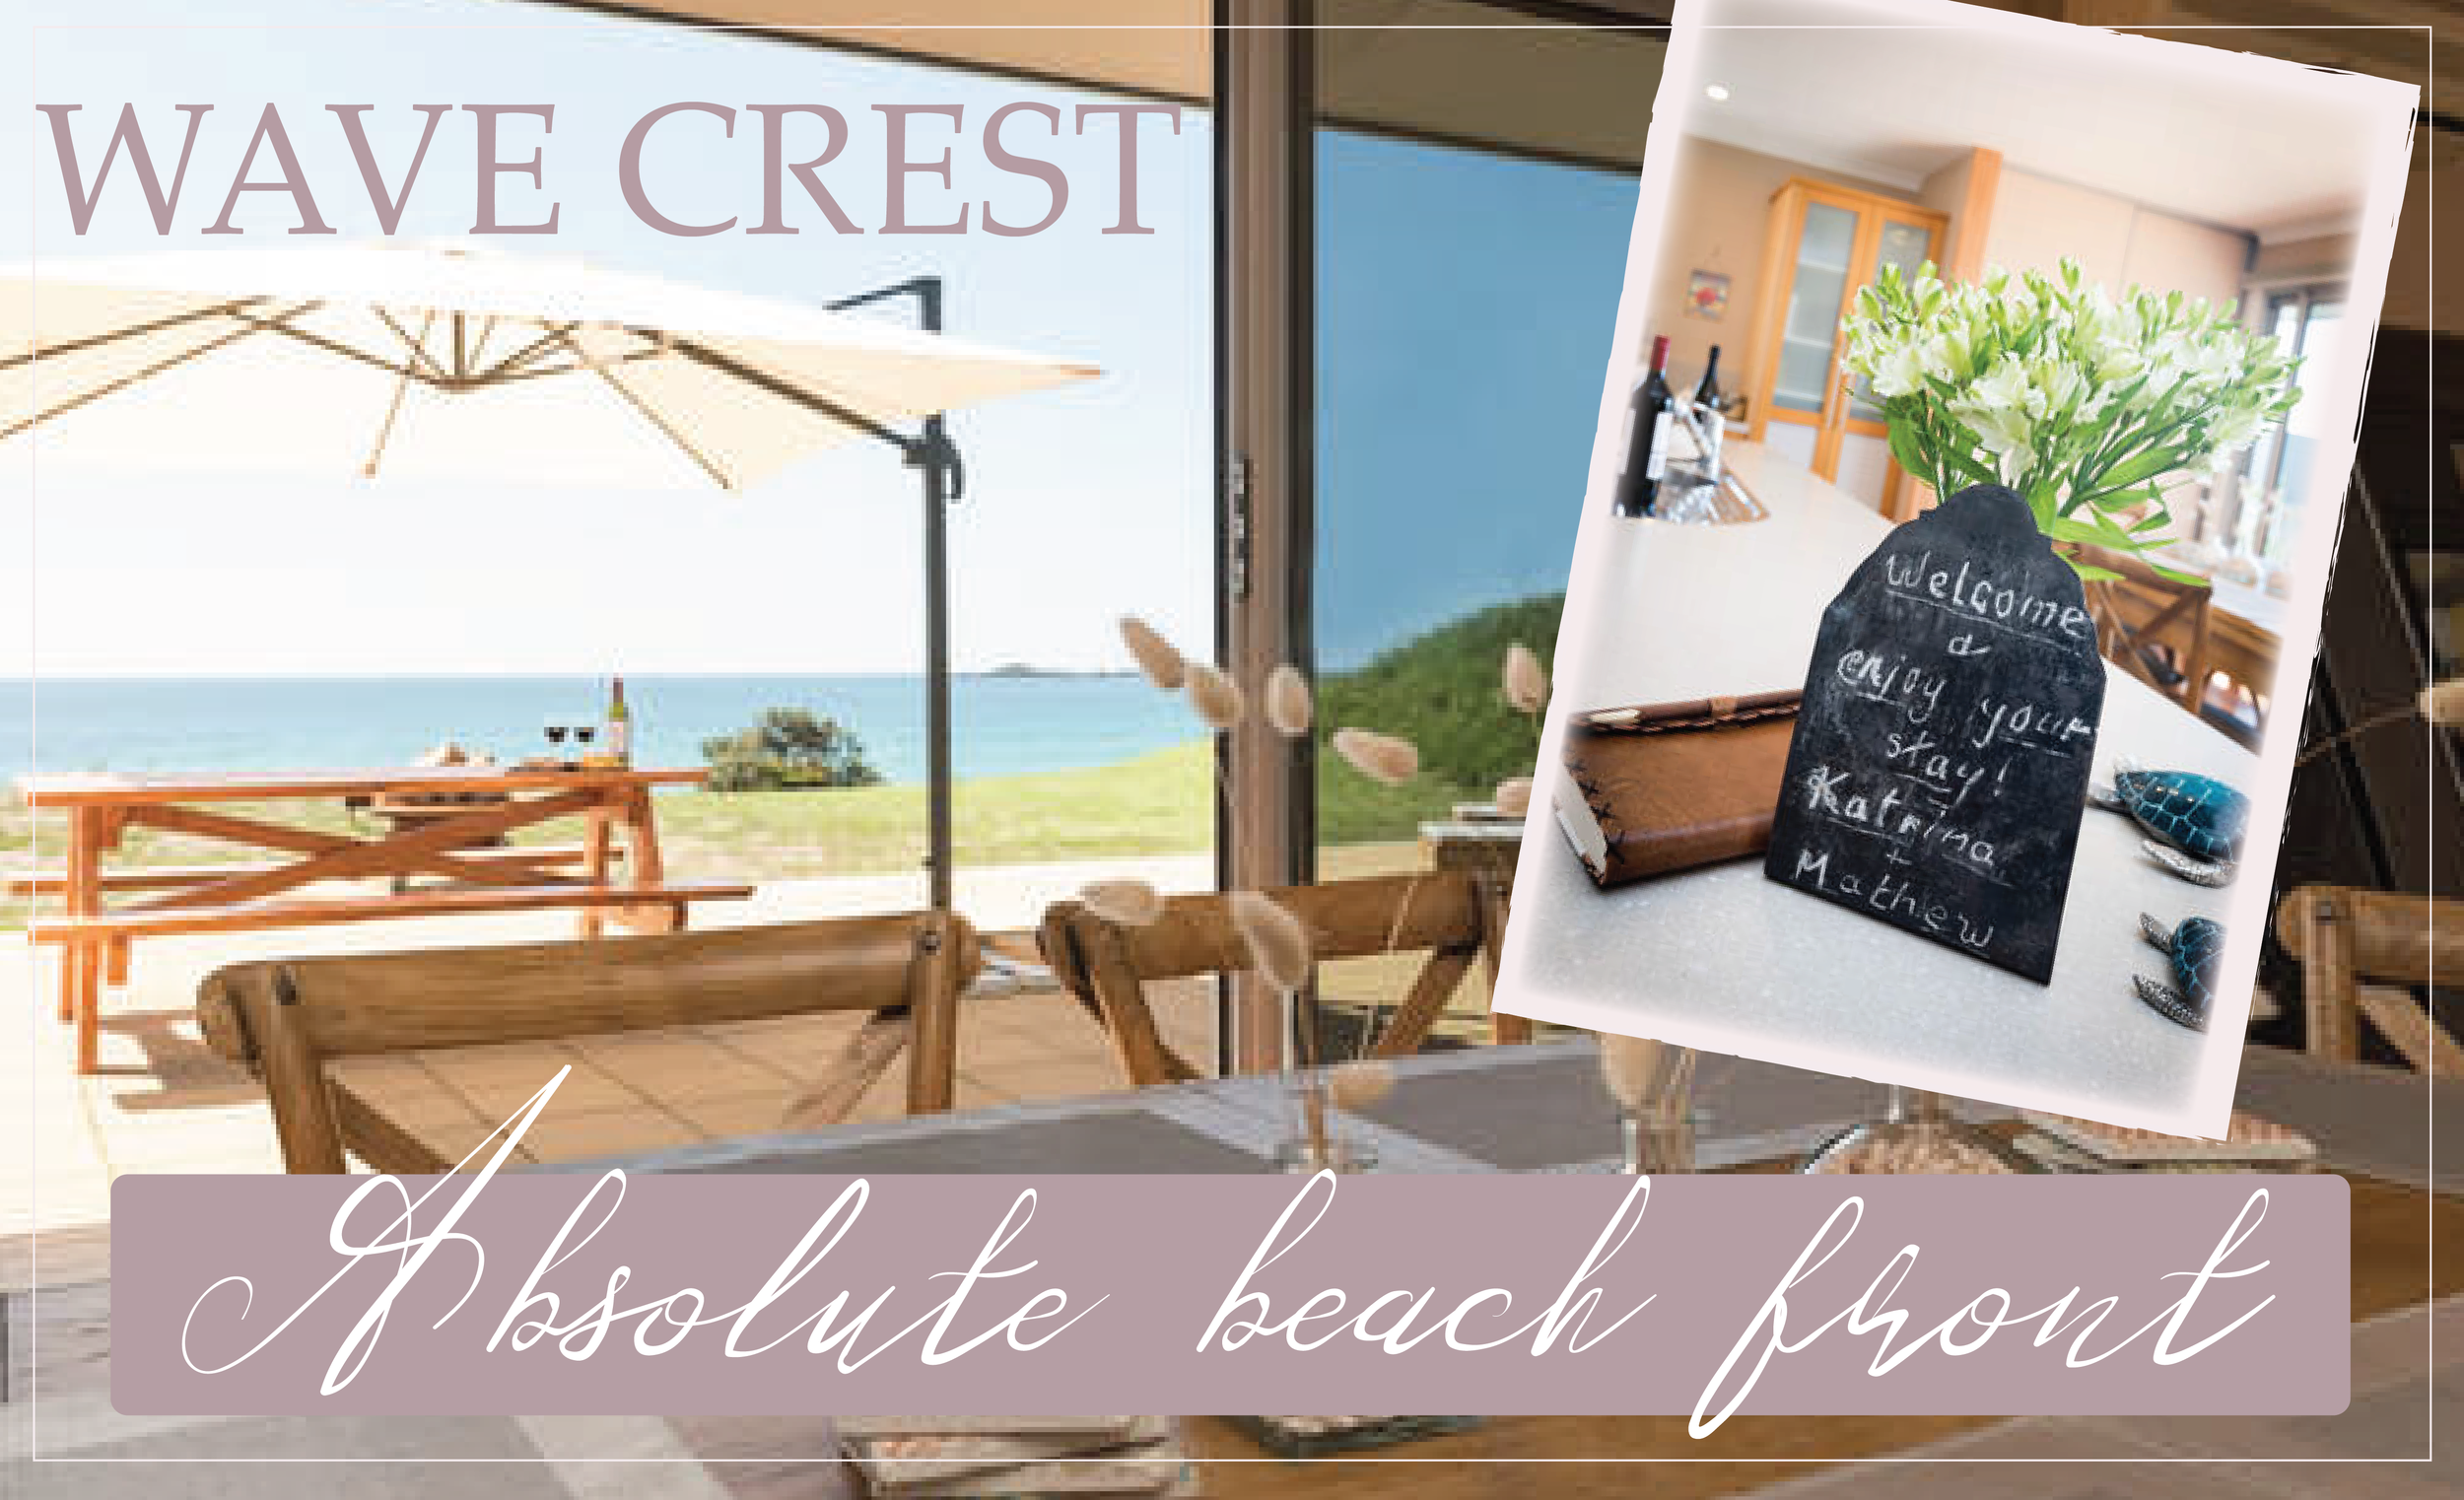 WAVE CREST  Features: Ocean Views, Sound bar/Jukebox, Modern Suite, Air Con, Sleeps 8 people in 4 bedrooms.  Visit website for details